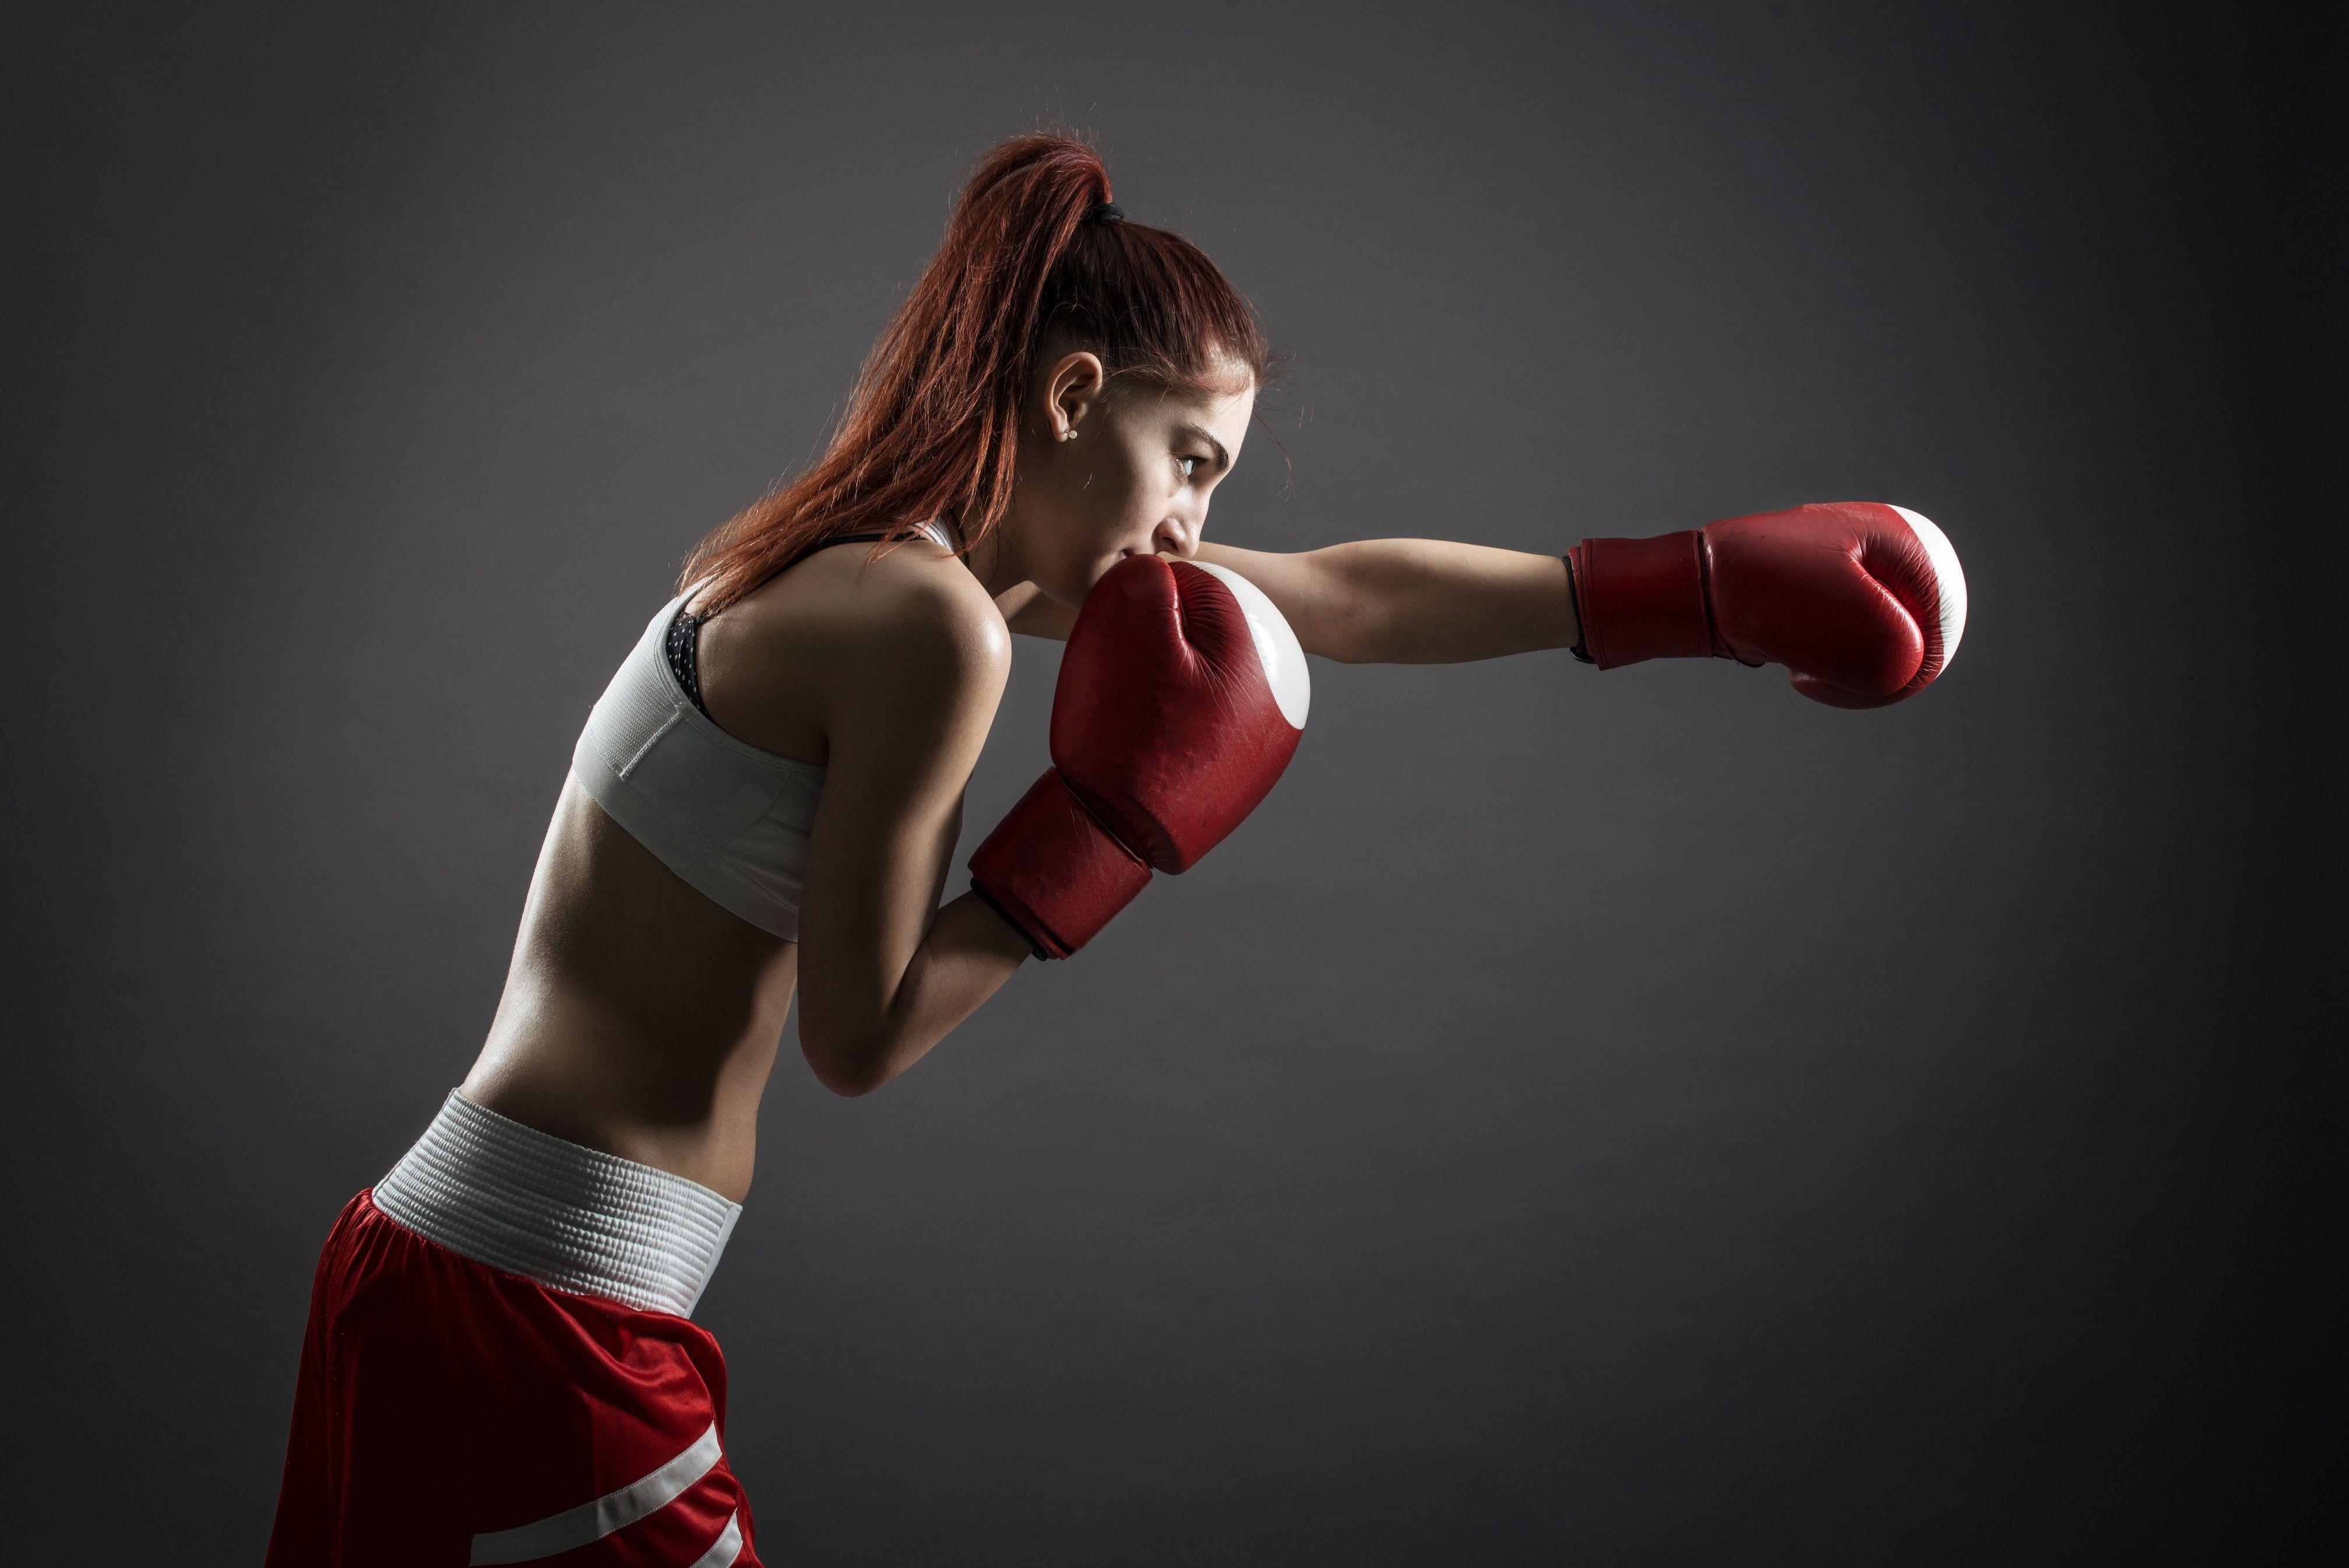 Women Boxer Wallpapers Wallpaper Cave